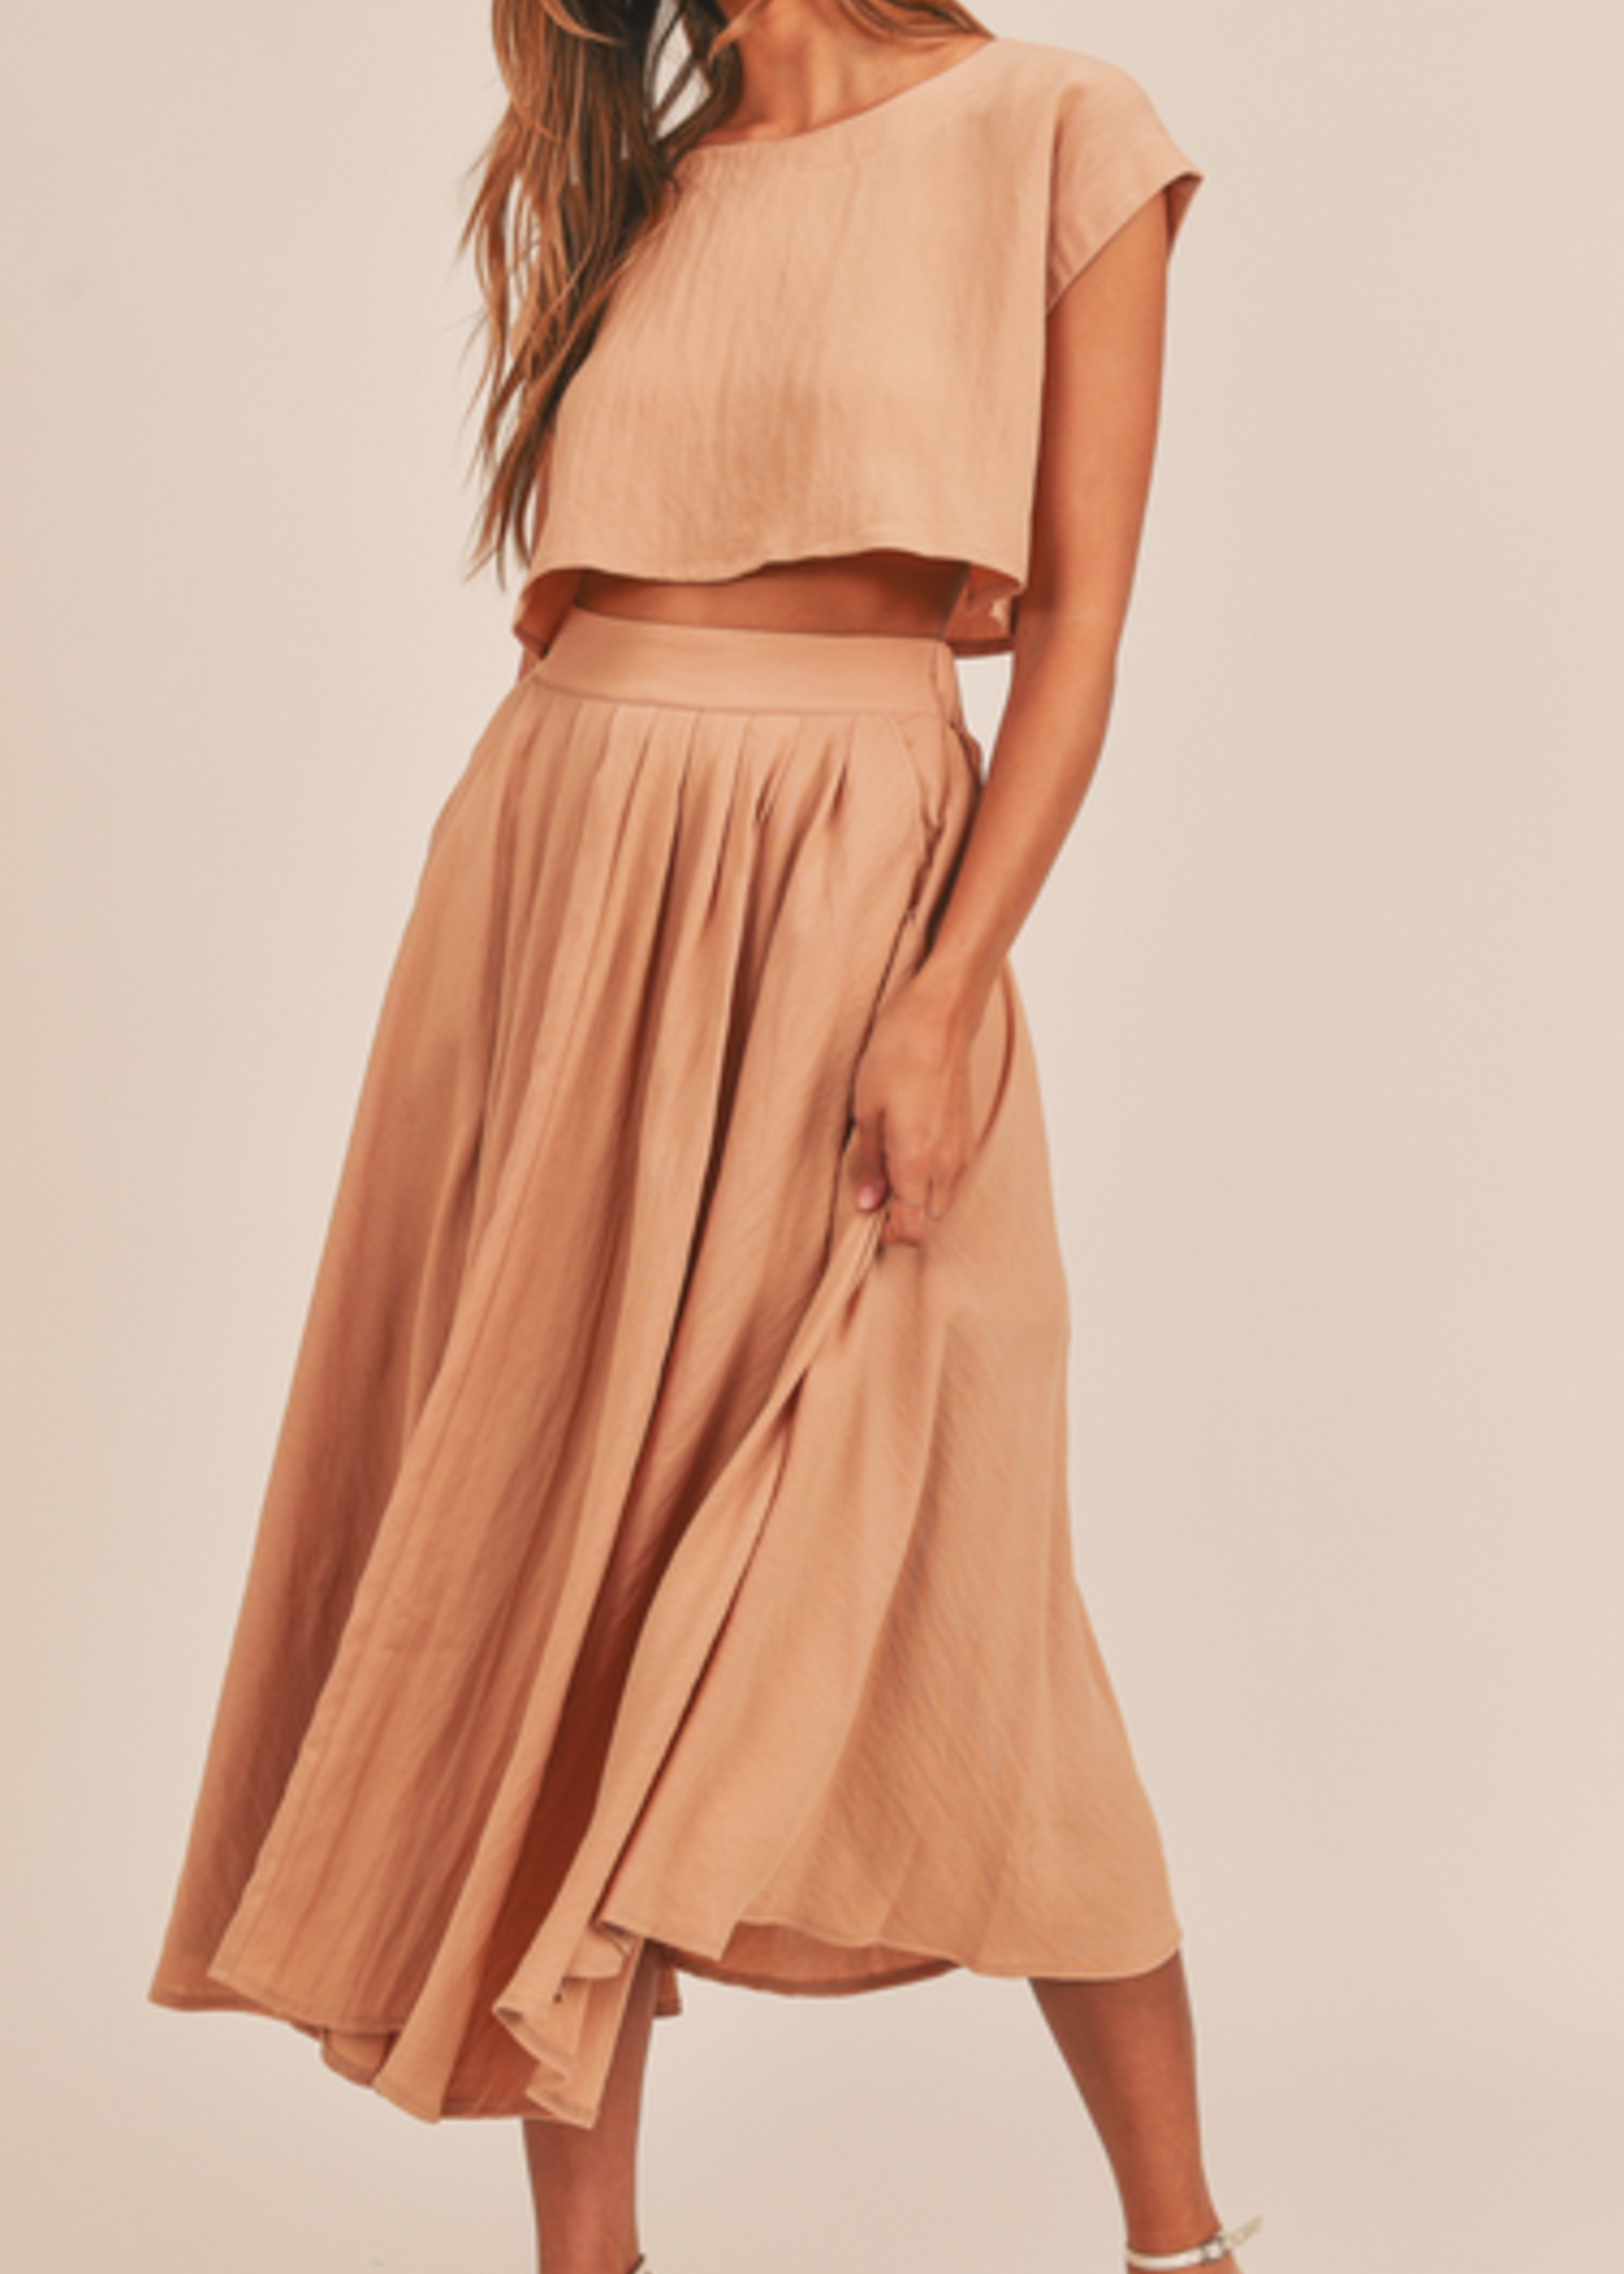 mable mable quinn skirt